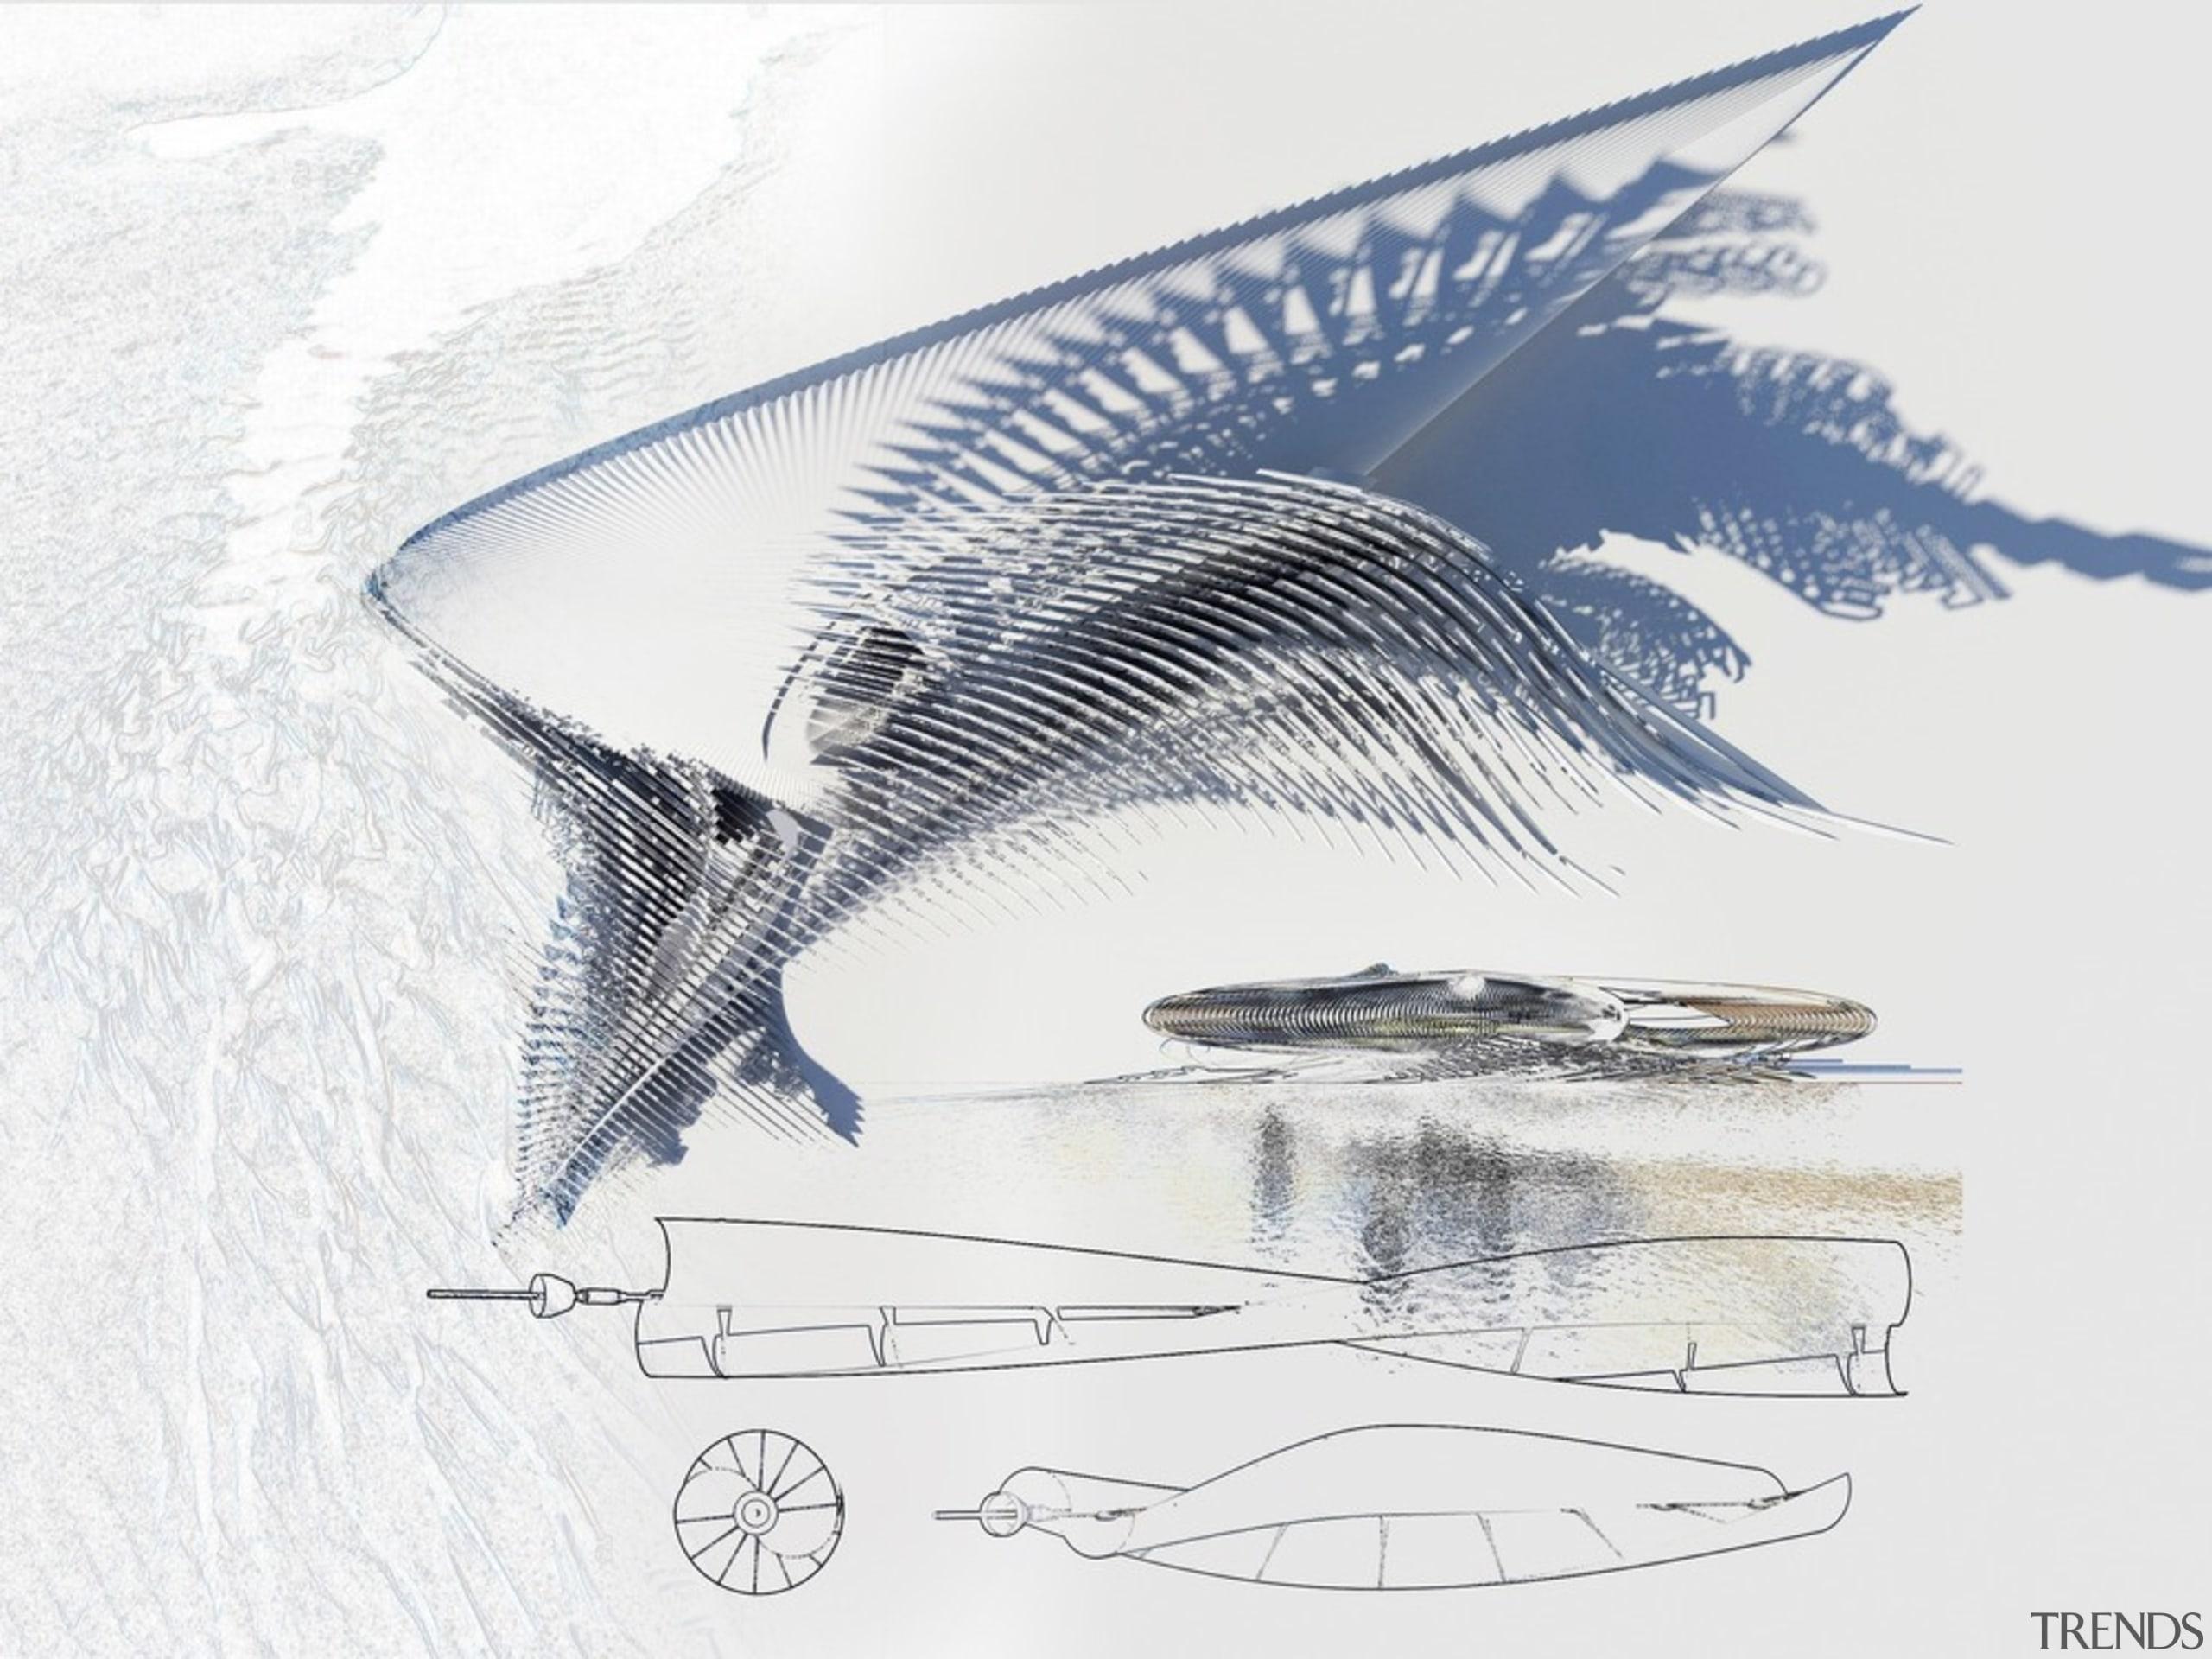 Harmonic Hotel 7 - artwork | automotive design artwork, automotive design, line, water, wing, white